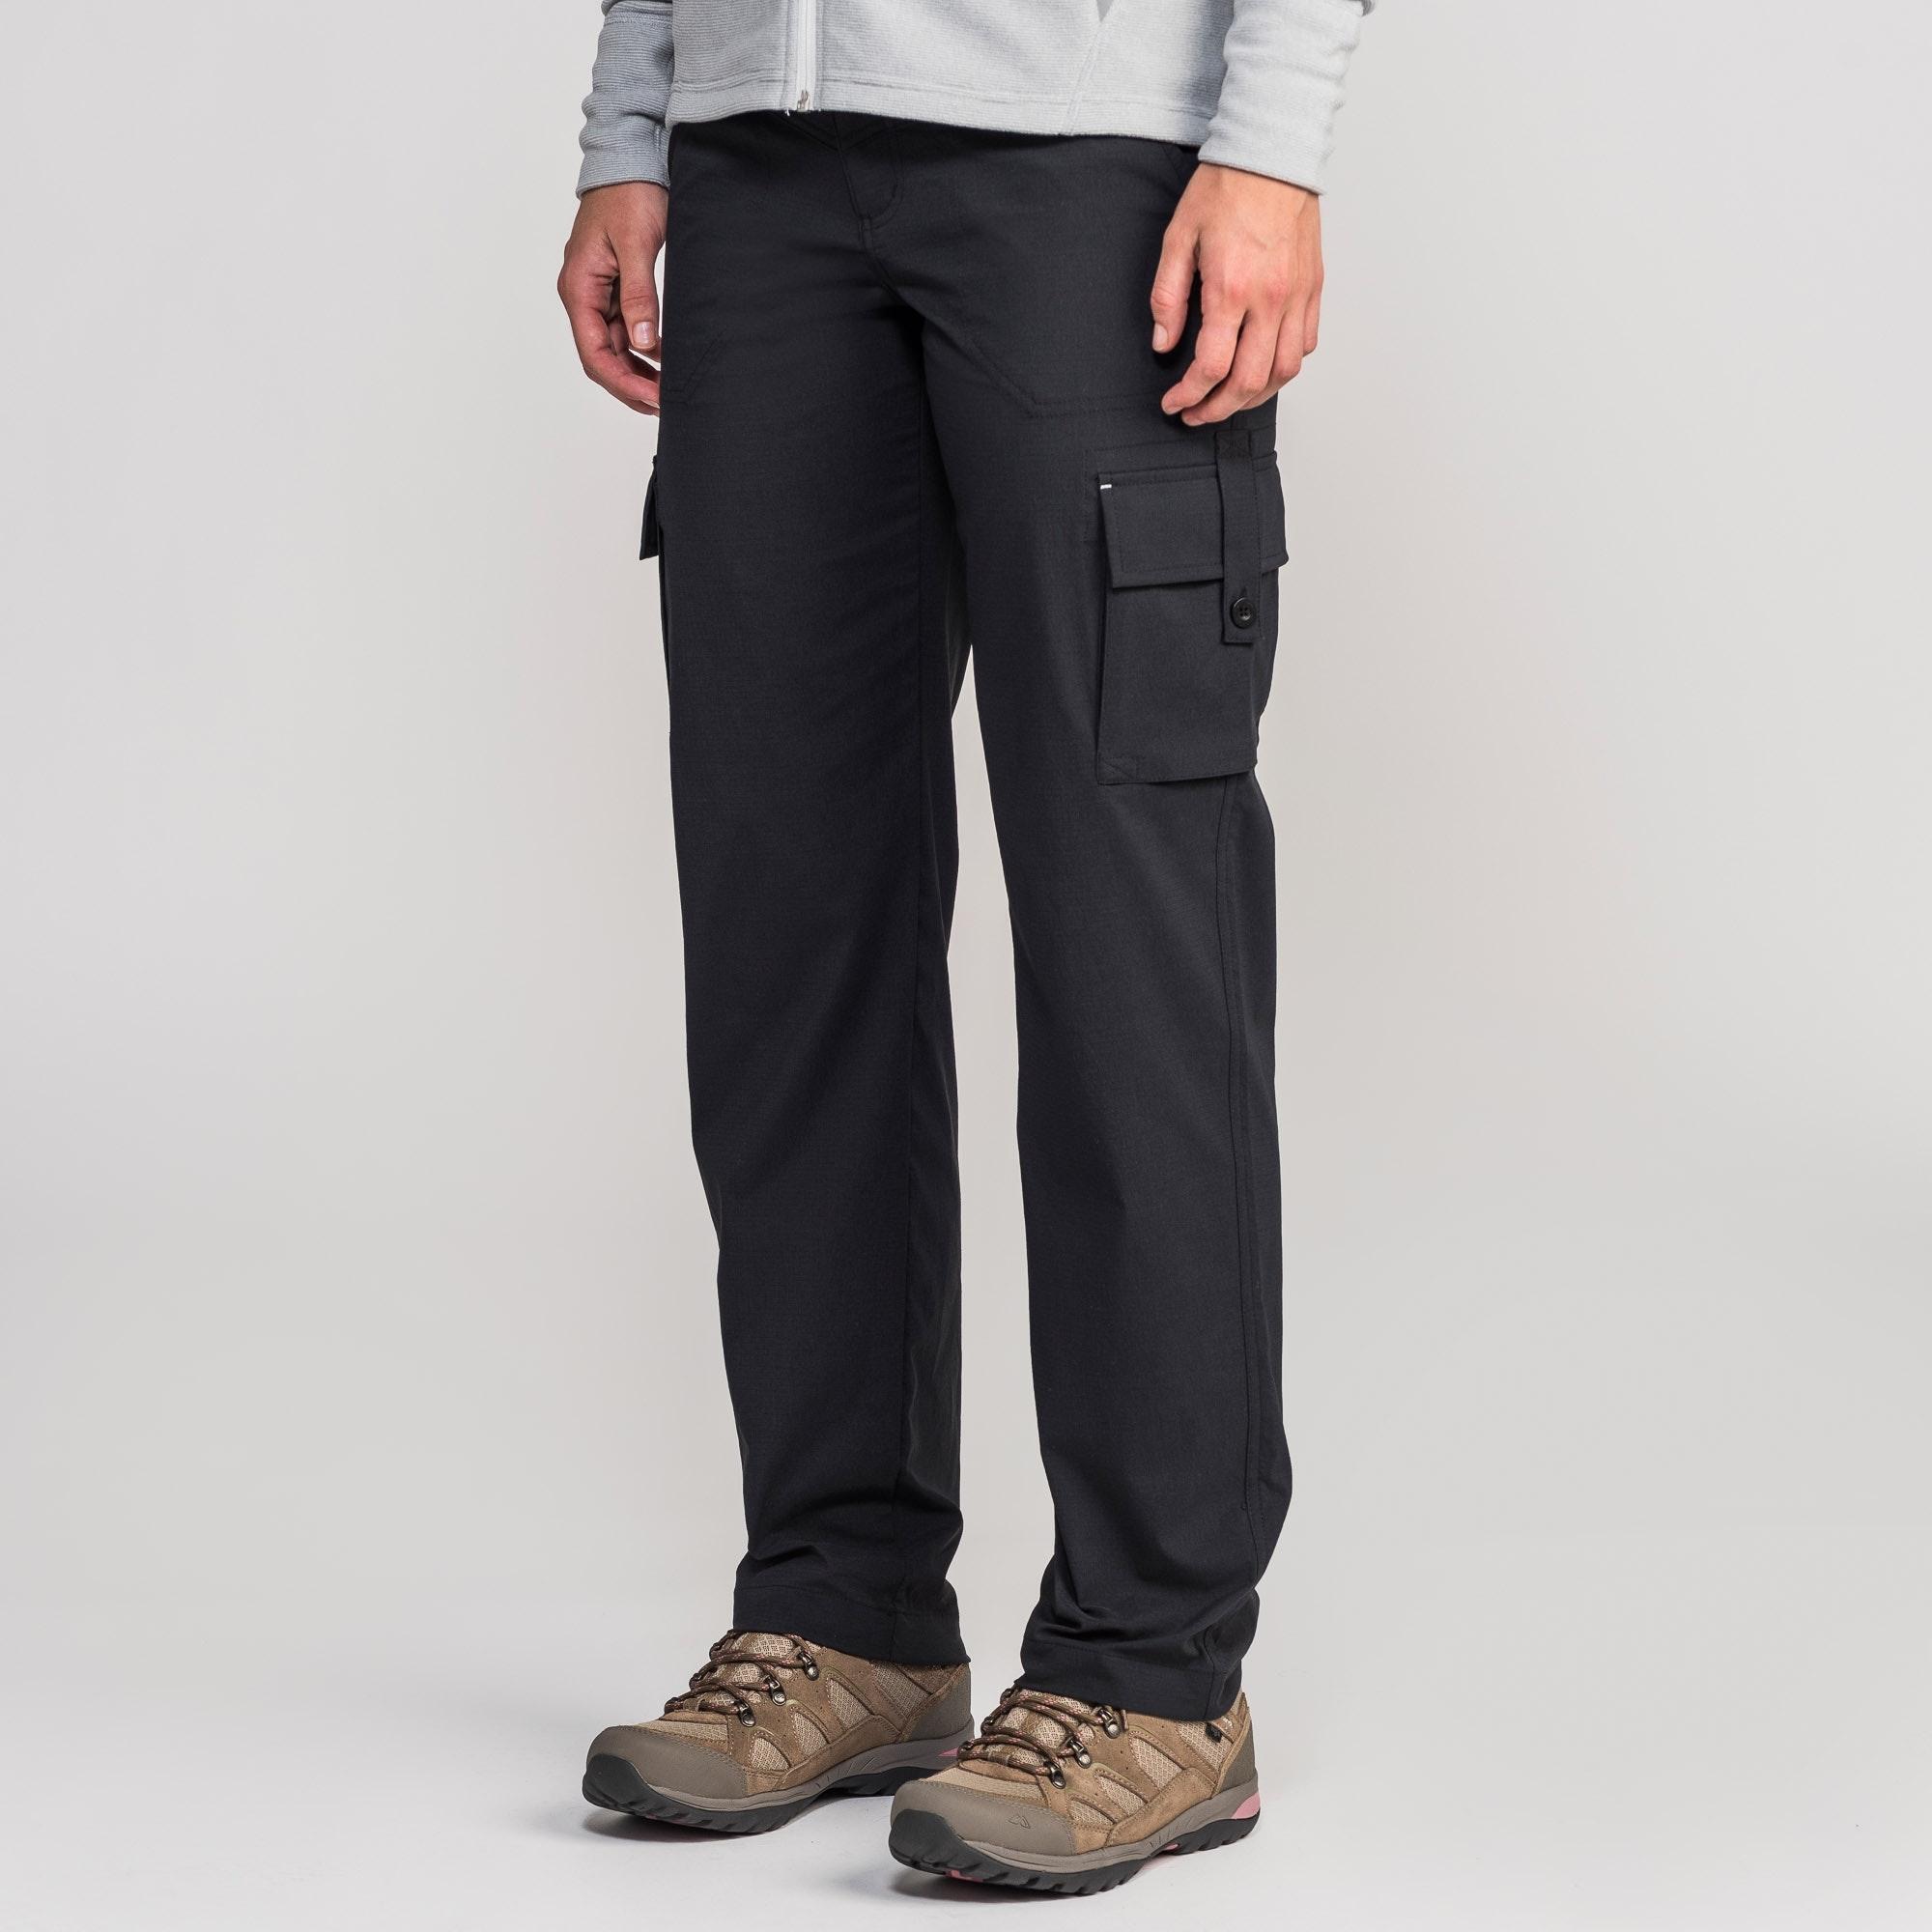 NEW-Kathmandu-Miro-Women-039-s-quickDRY-Pants-Trousers-Stretch-Travel-Cargo-Recycled thumbnail 11